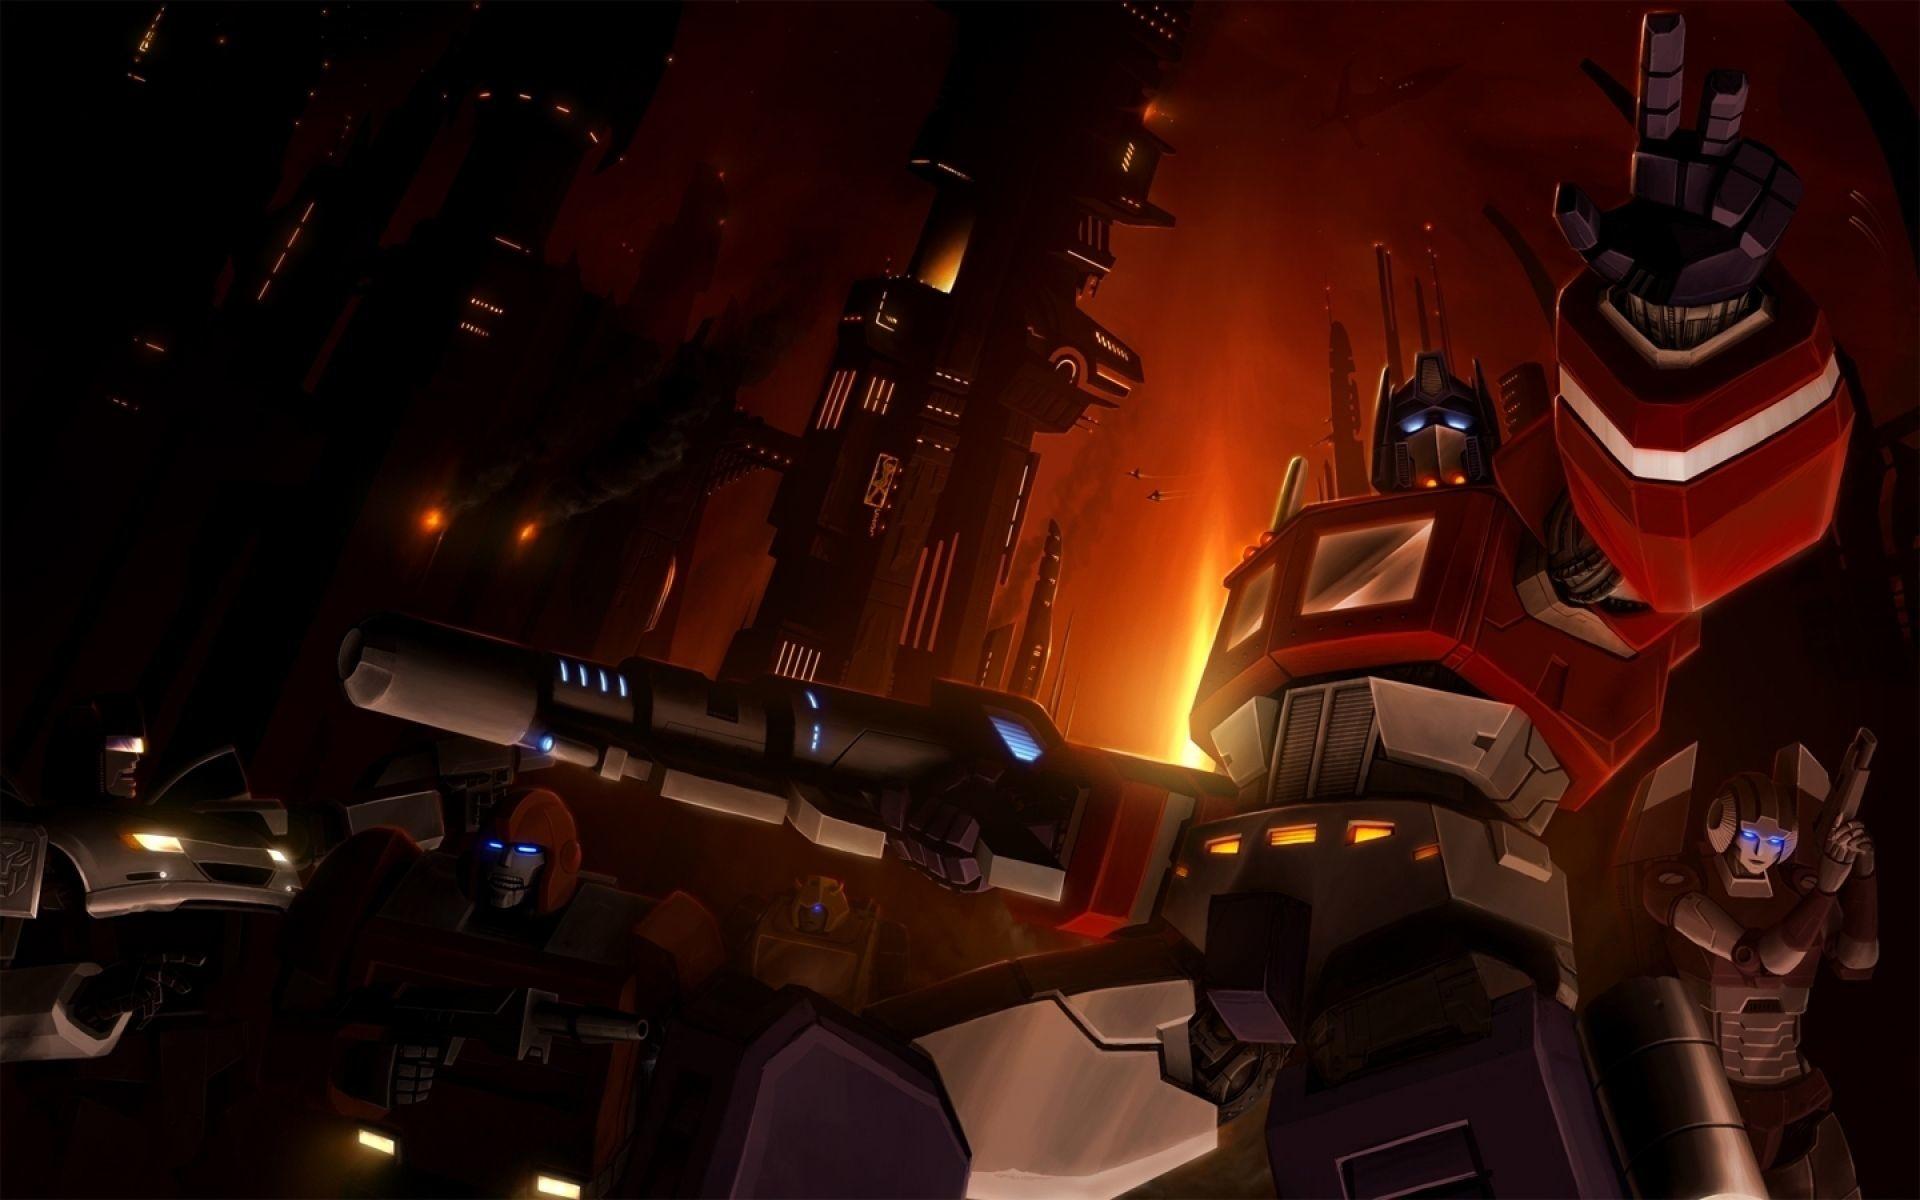 16 optimus prime transformers transformers g1 1440×900 wallpaper .